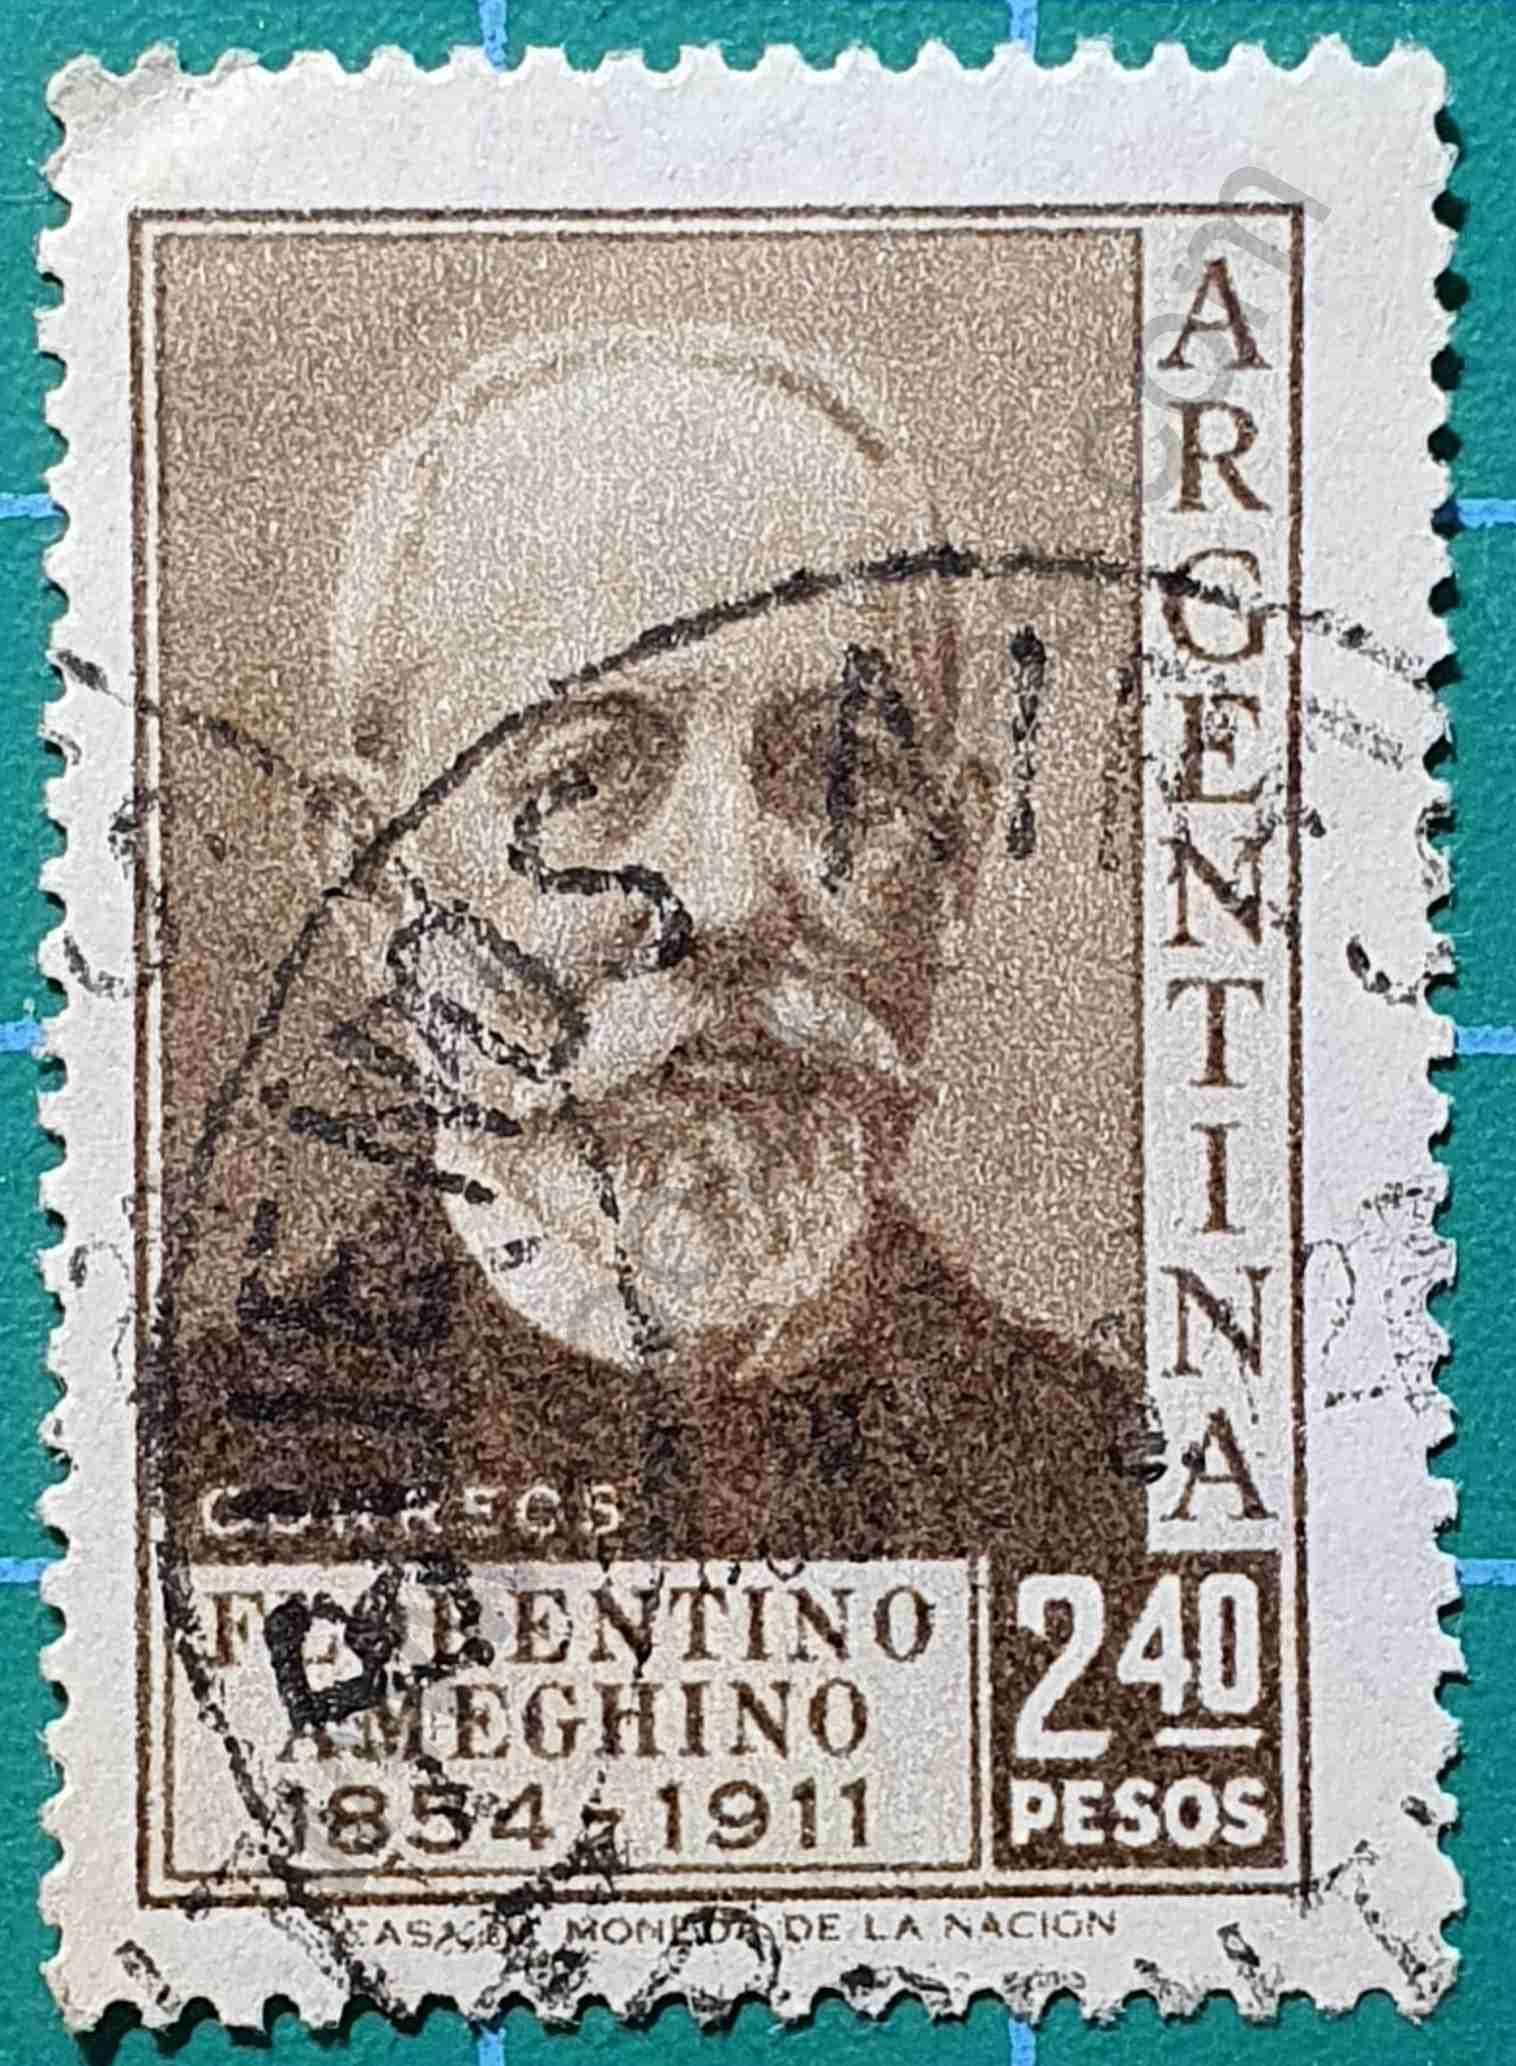 Florentino Ameghino - Sello Argentina 1956